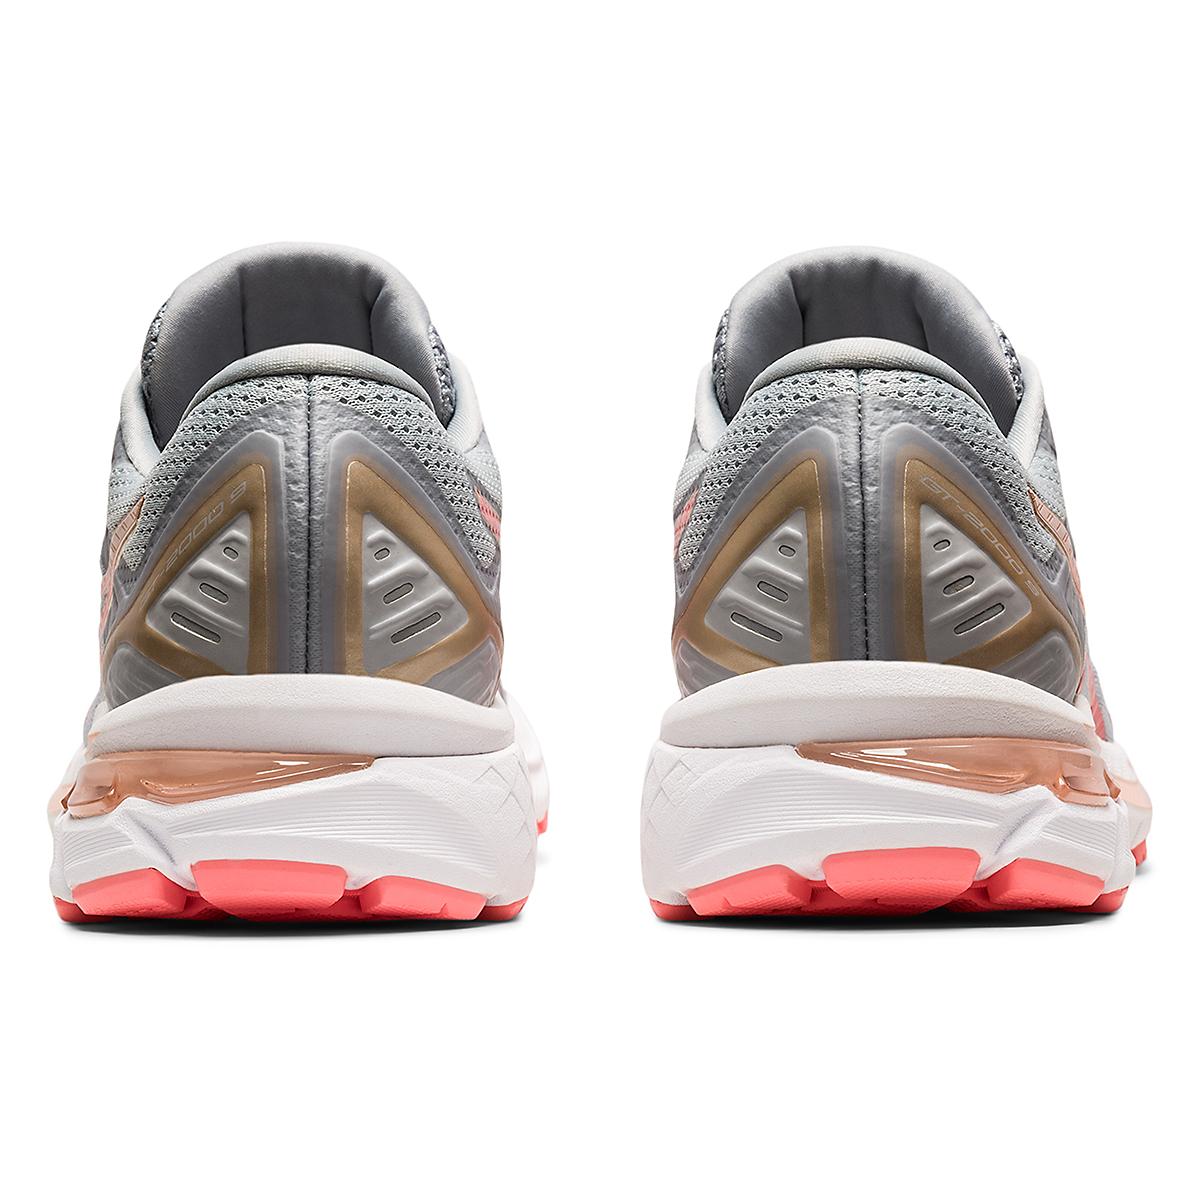 Women's Asics GT-2000 9 Running Shoe - Color: Piedmont Grey/Guava - Size: 5 - Width: Regular, Piedmont Grey/Guava, large, image 6